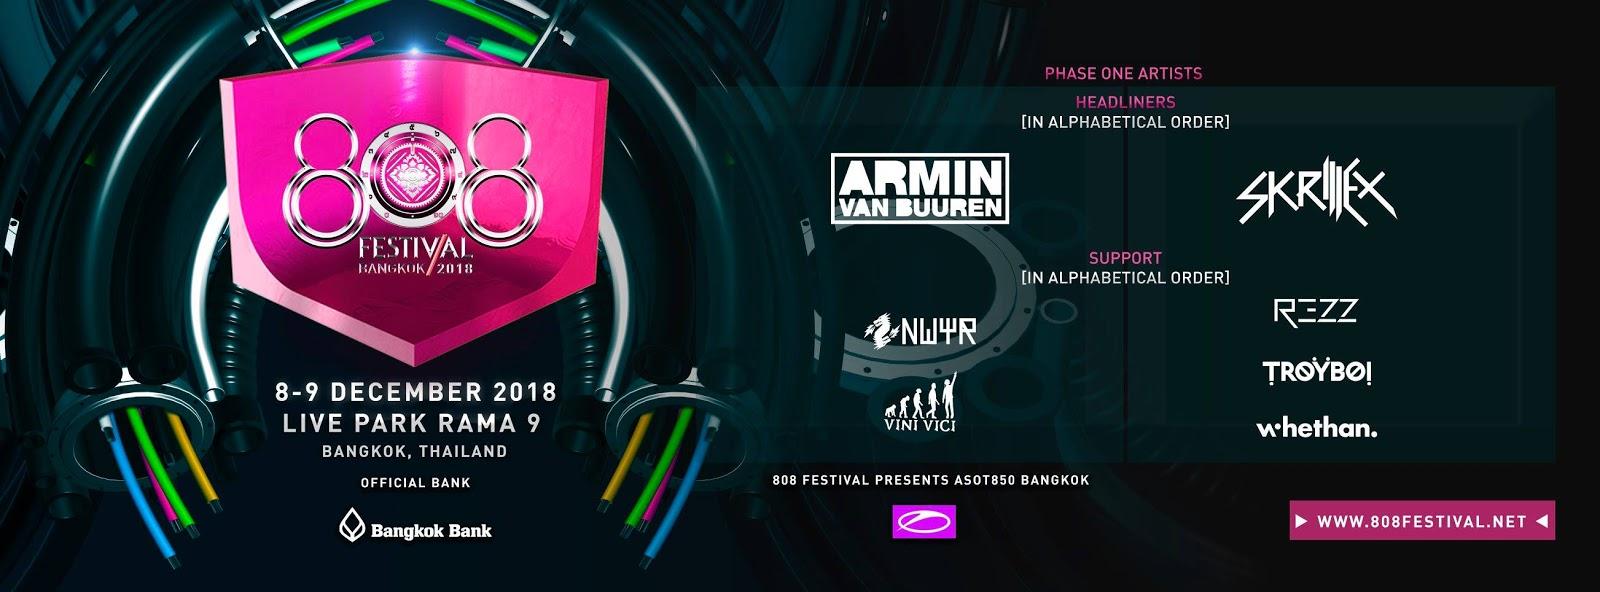 808 Festival, Thailand 2018